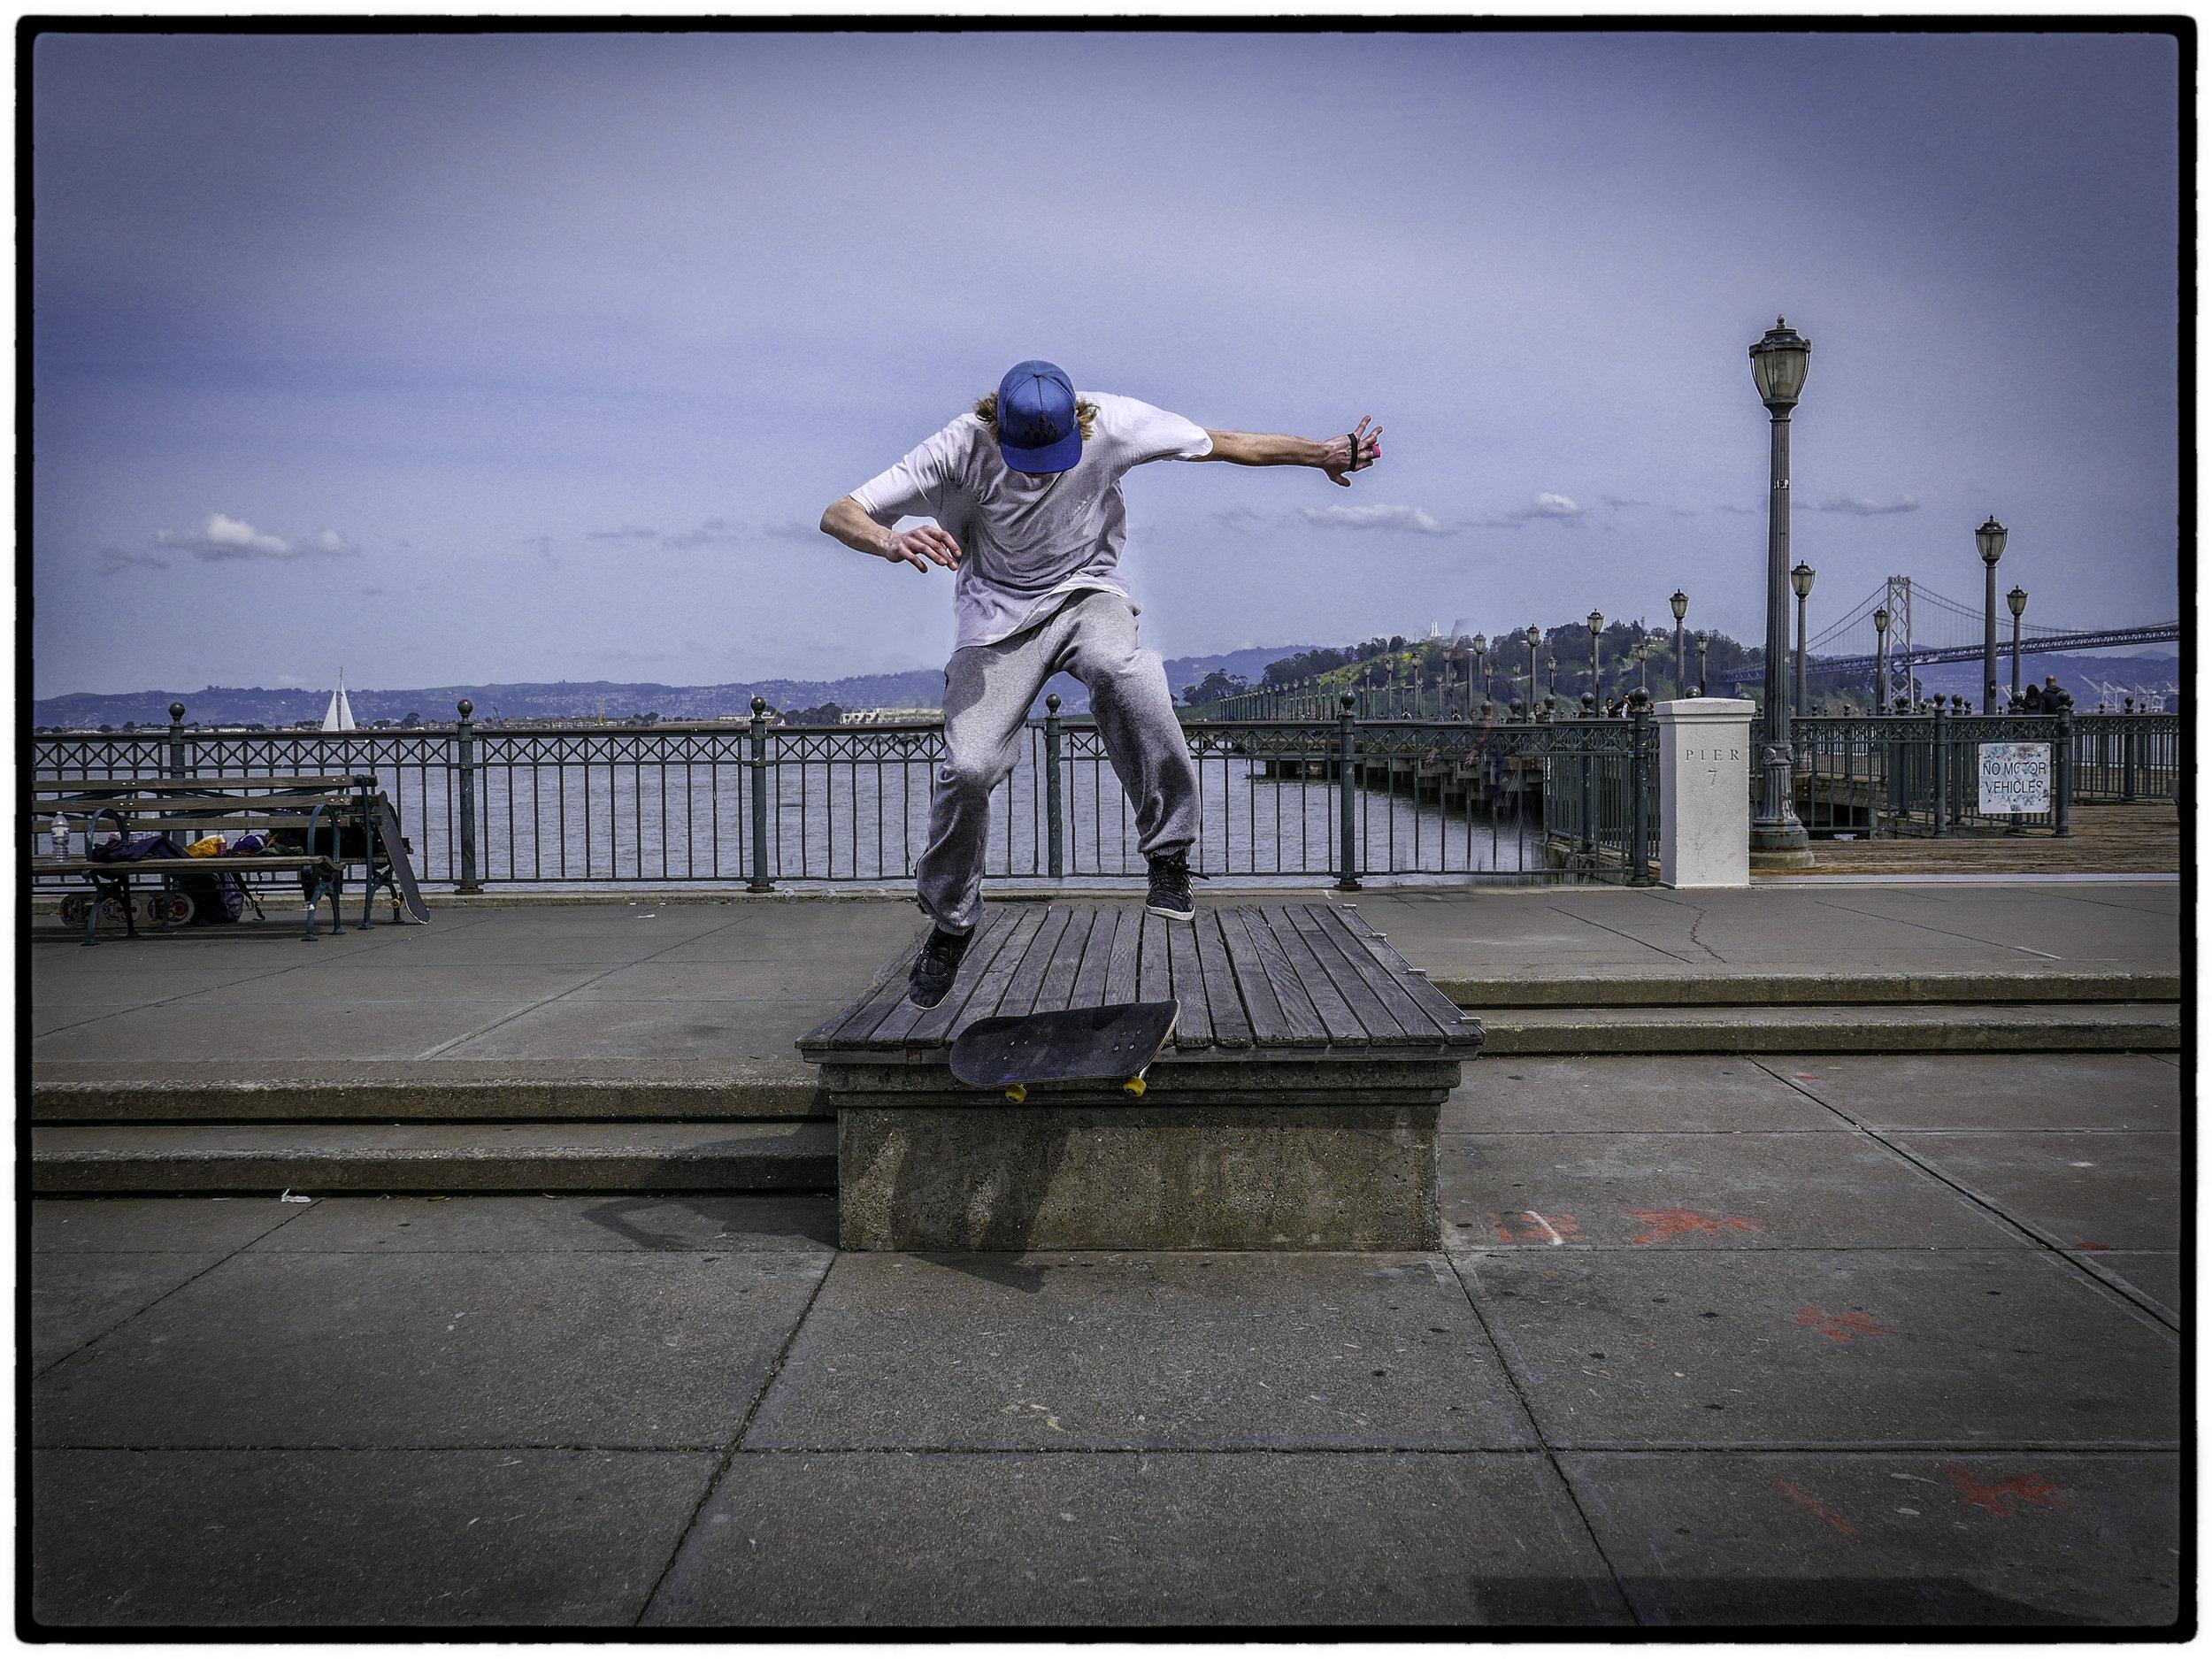 Skateboarder, Embarcadero, SF 4/19